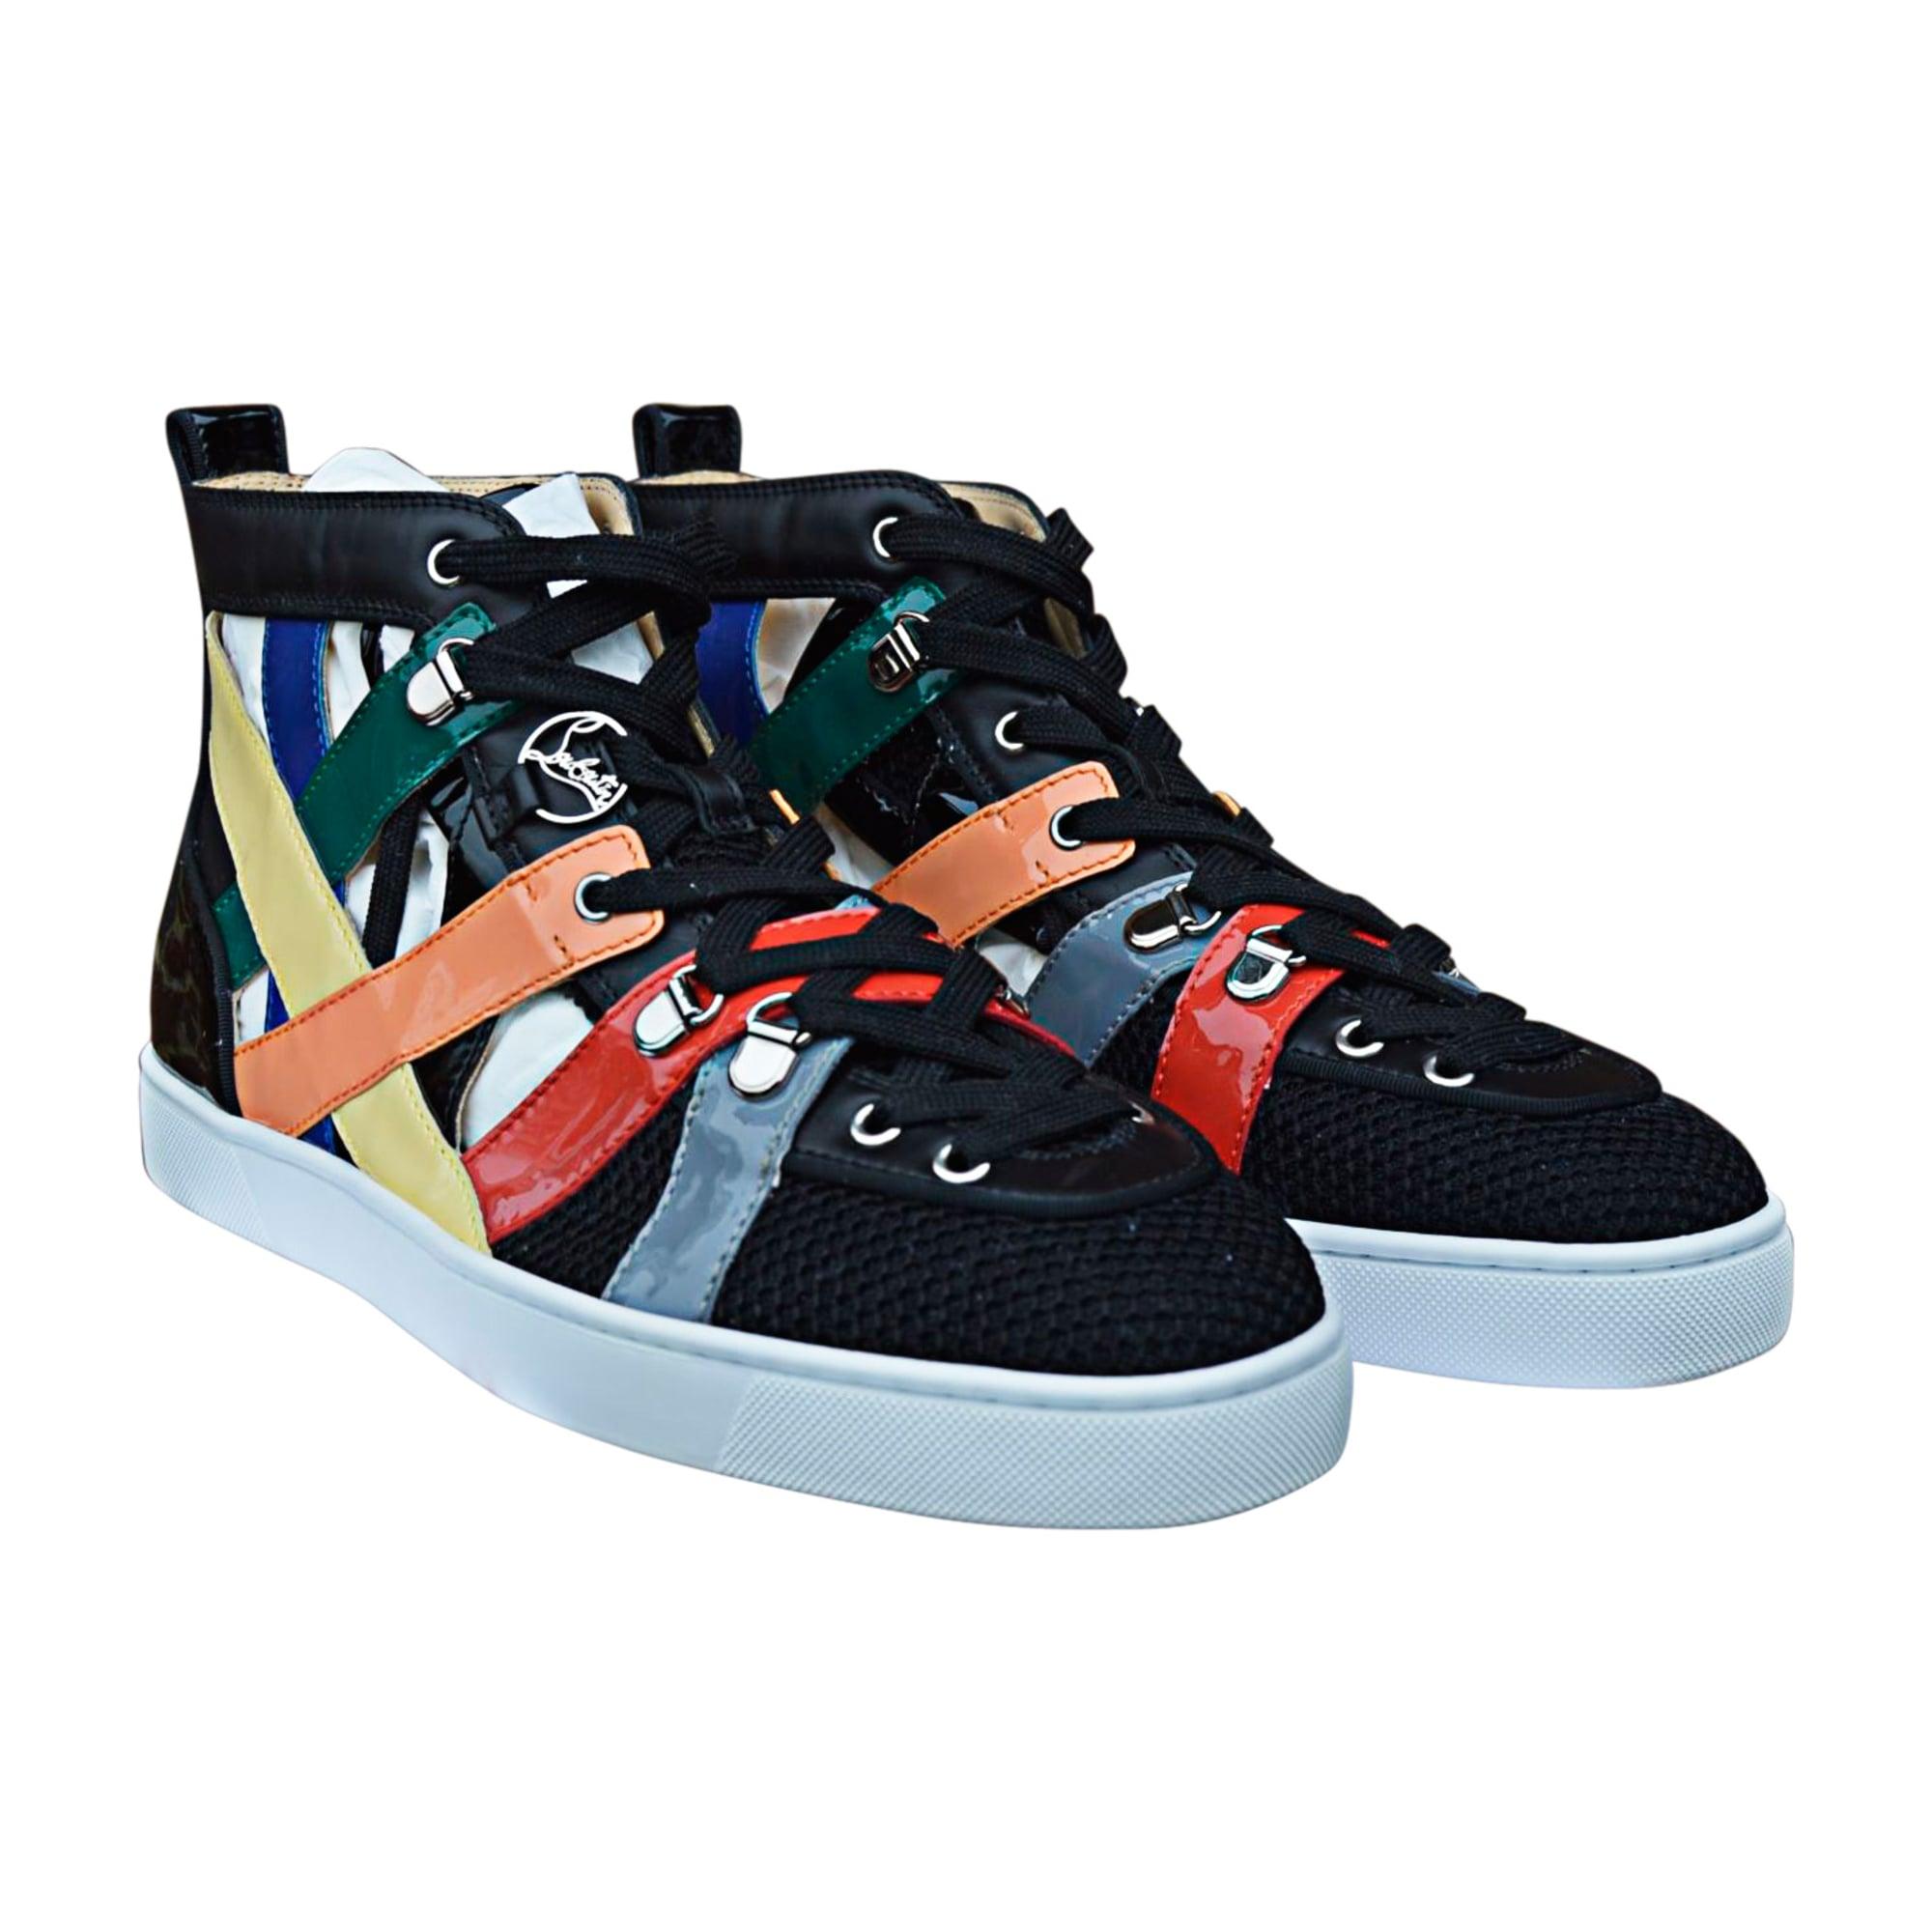 Sneakers CHRISTIAN LOUBOUTIN multicolour